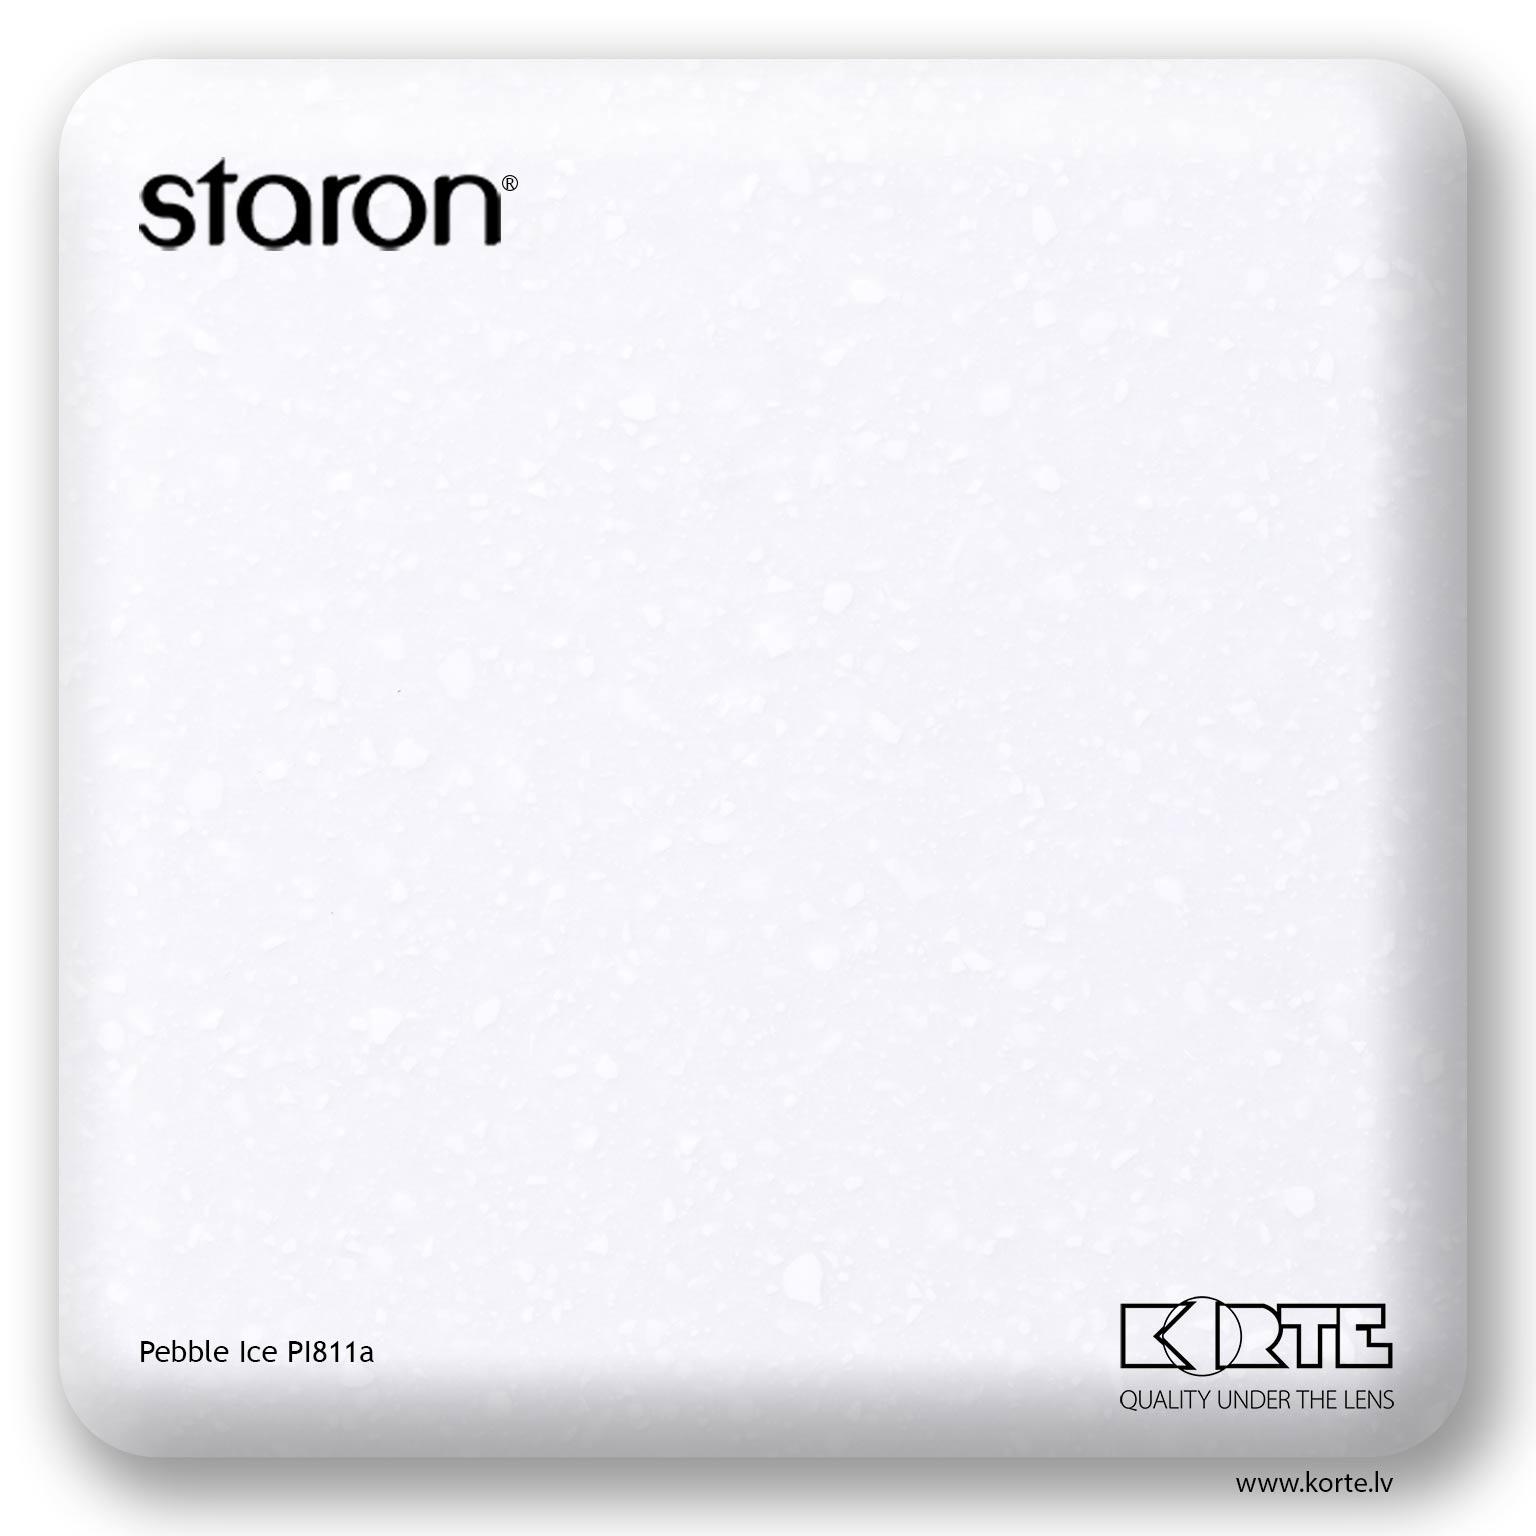 Staron Pebble Ice PI811